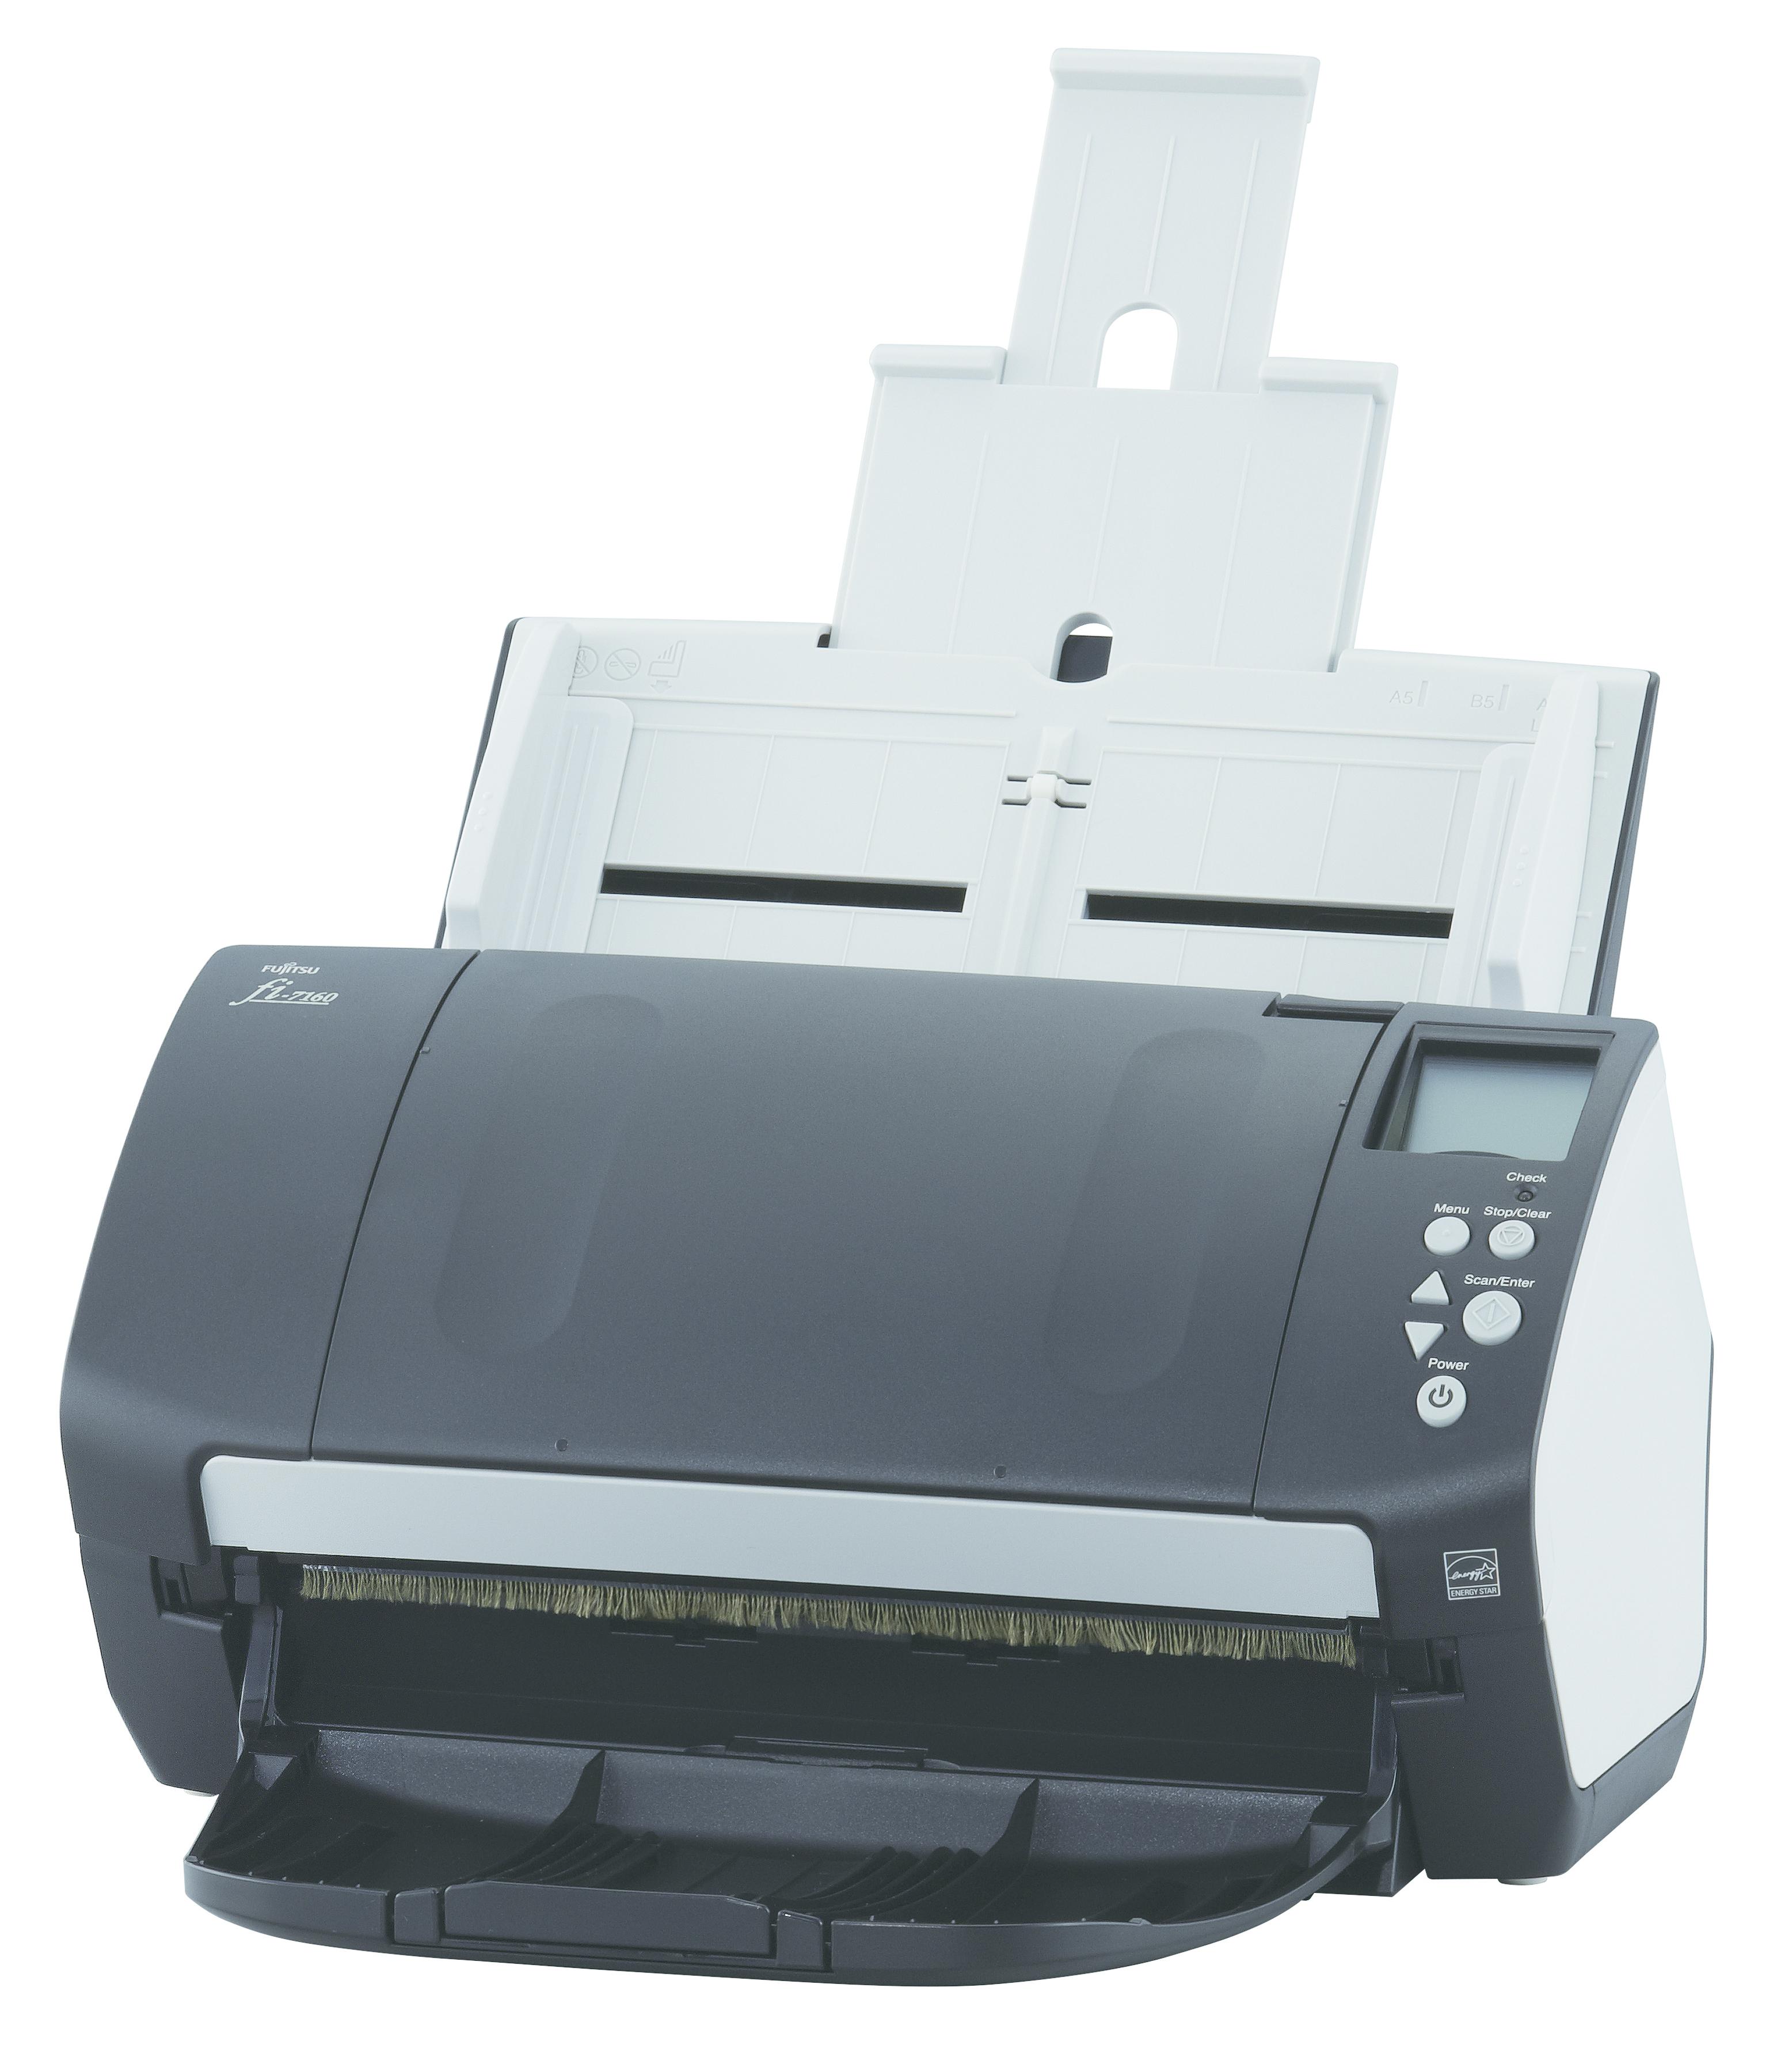 Fujitsu fi-7160 ADF scanner 600 x 600DPI A4 Schwarz - Weiß